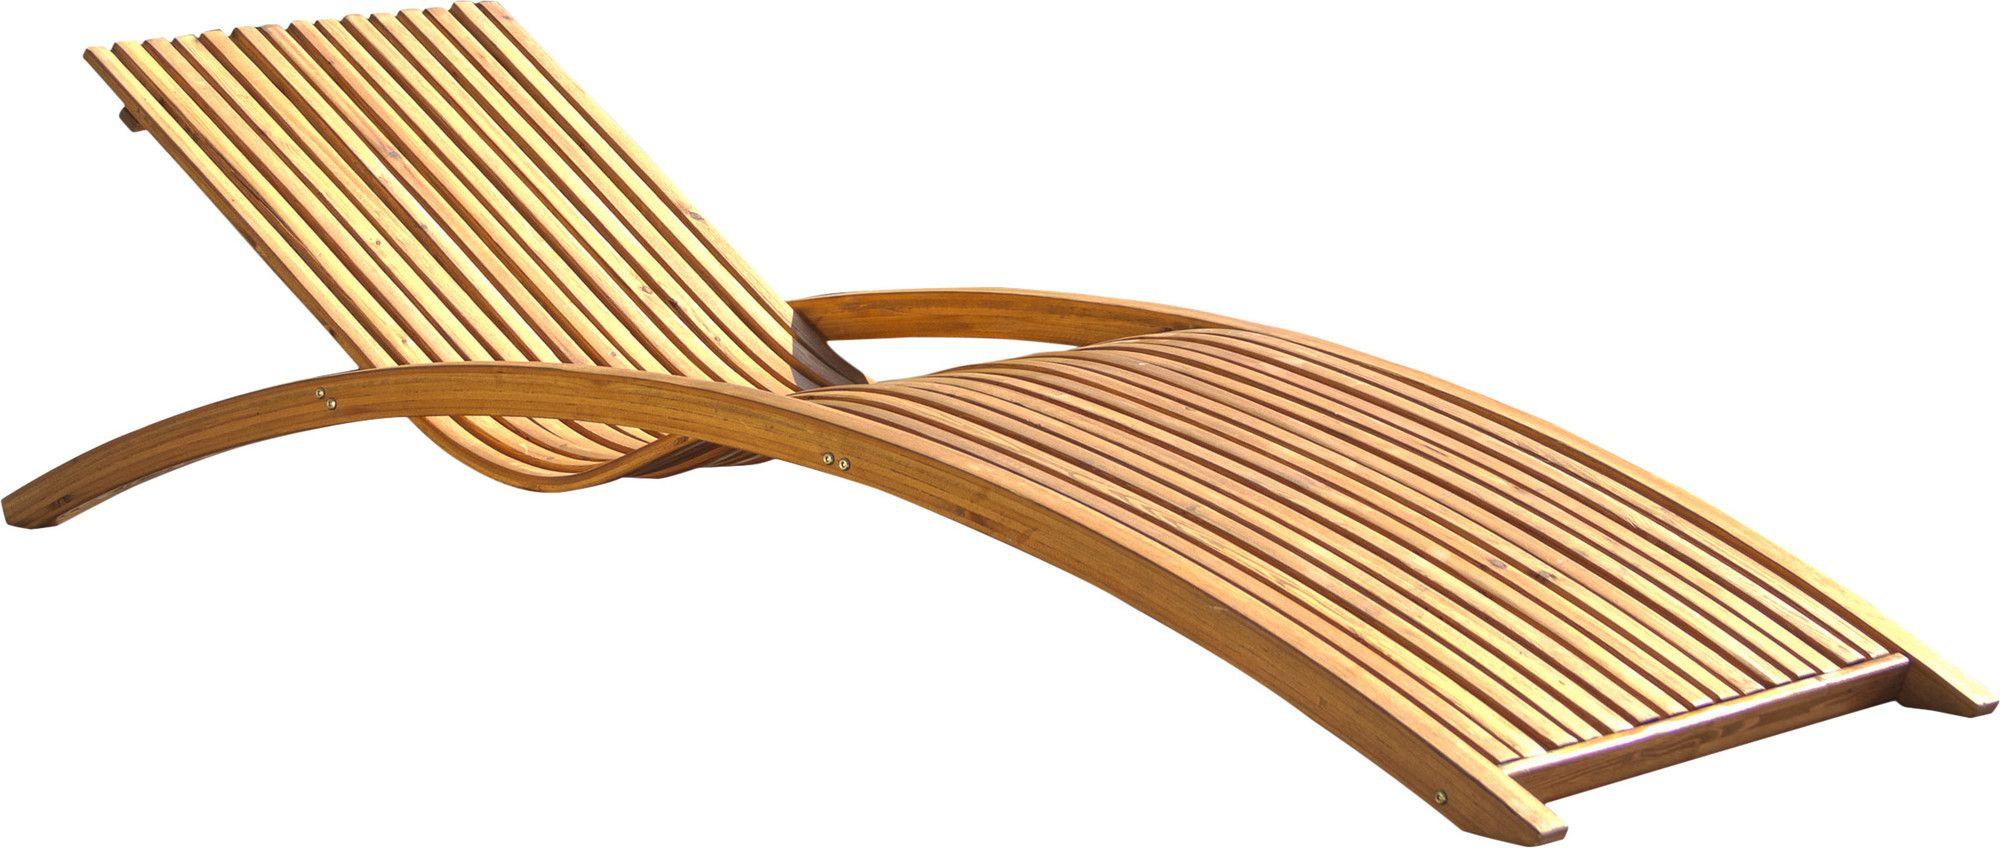 Denton Patio Chaise Lounge Chair Outdoor Folding Lounge Chair Outdoor Chaise Lounge